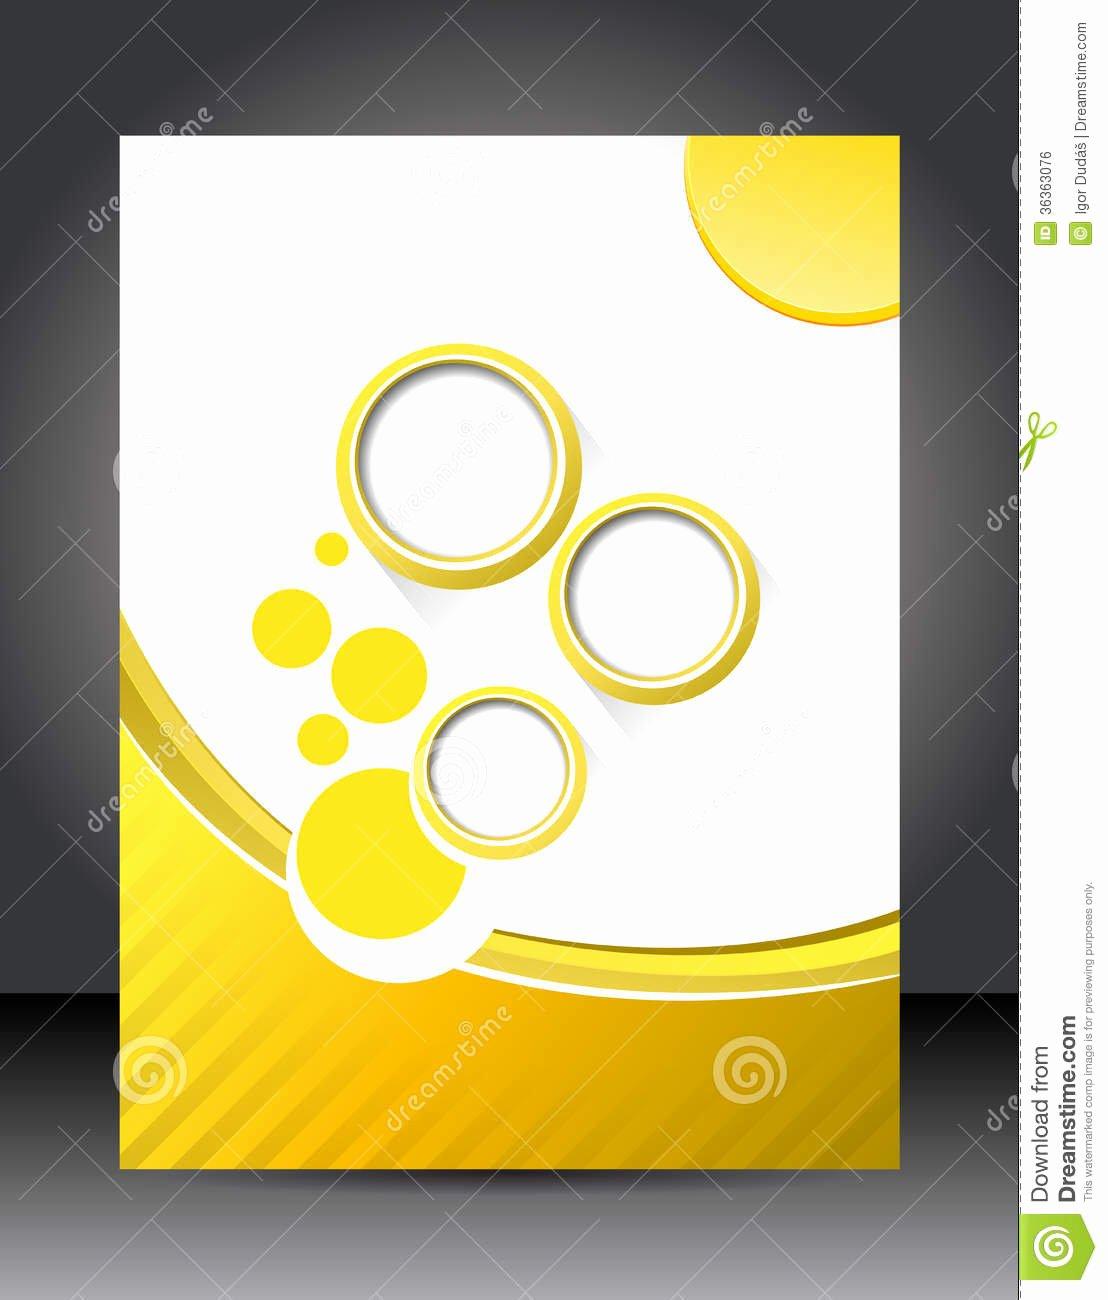 Design Layout Template Stock Illustration Illustration Of